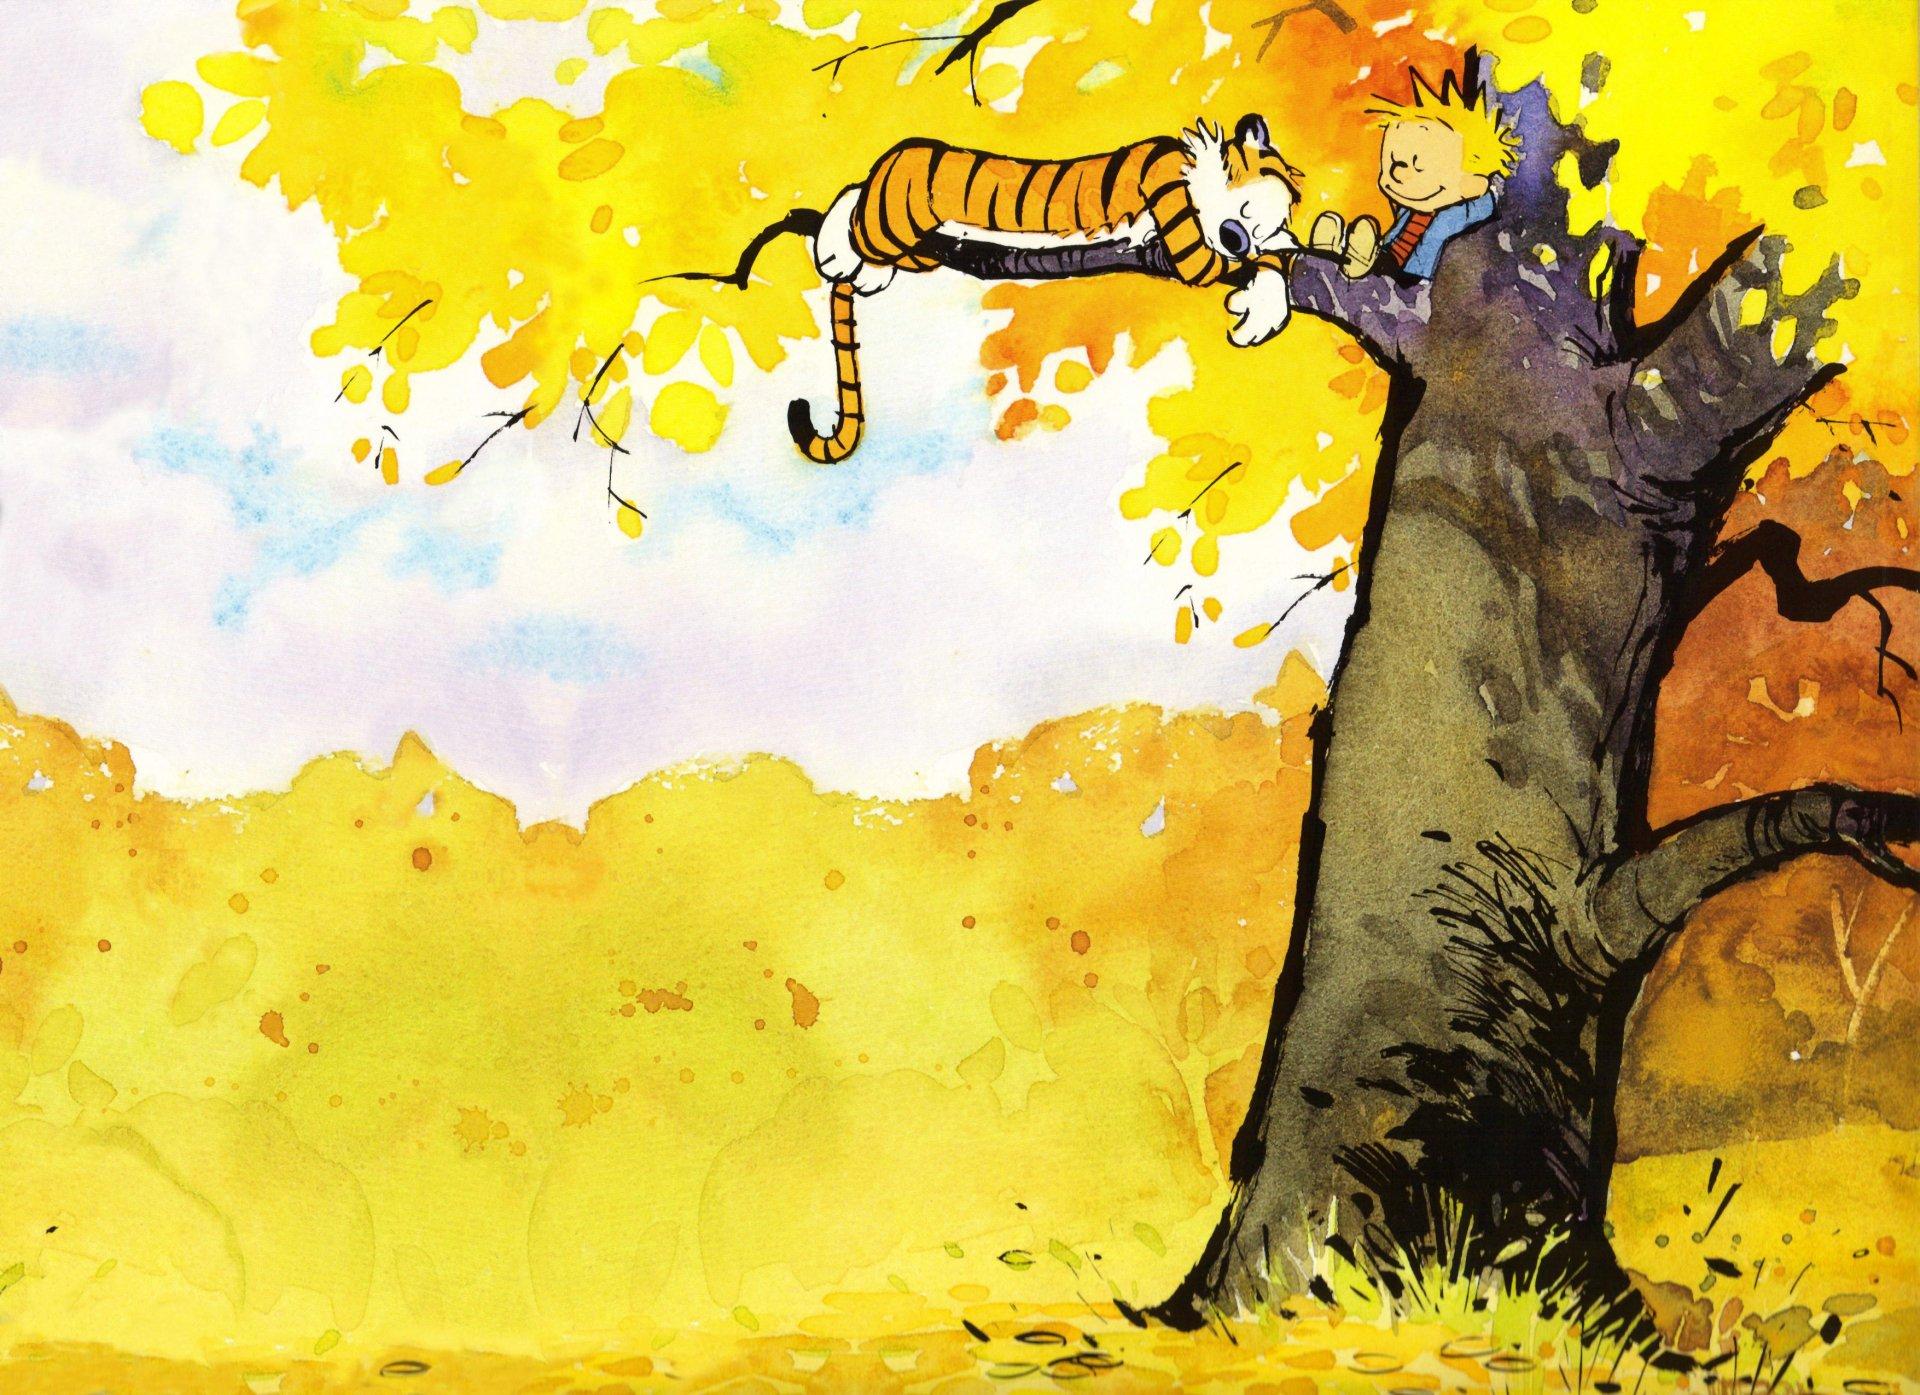 Comics - Calvin & Hobbes  Hobbes (Calvin & Hobbes) Calvin (Calvin & Hobbes) Wallpaper